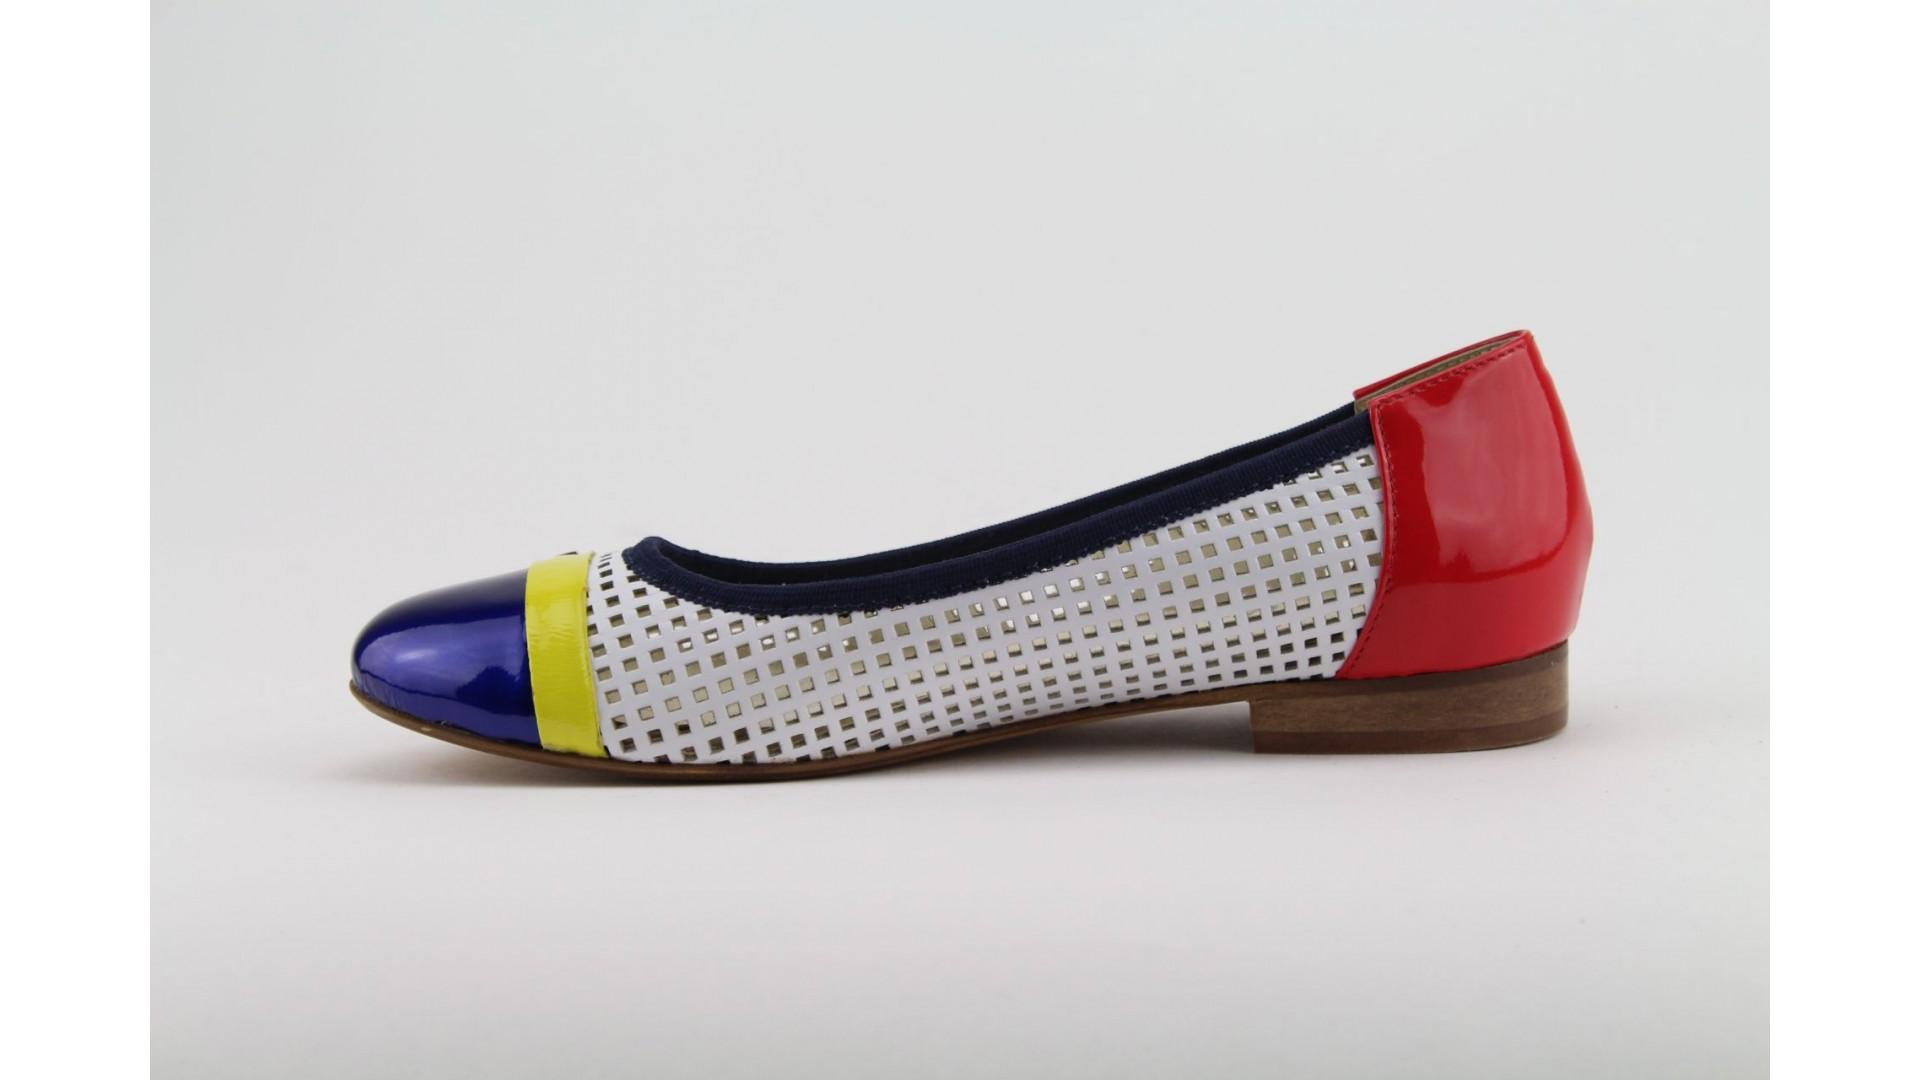 1b7ddb6830 POLANSKI fehér-piros-kék balerina cipő